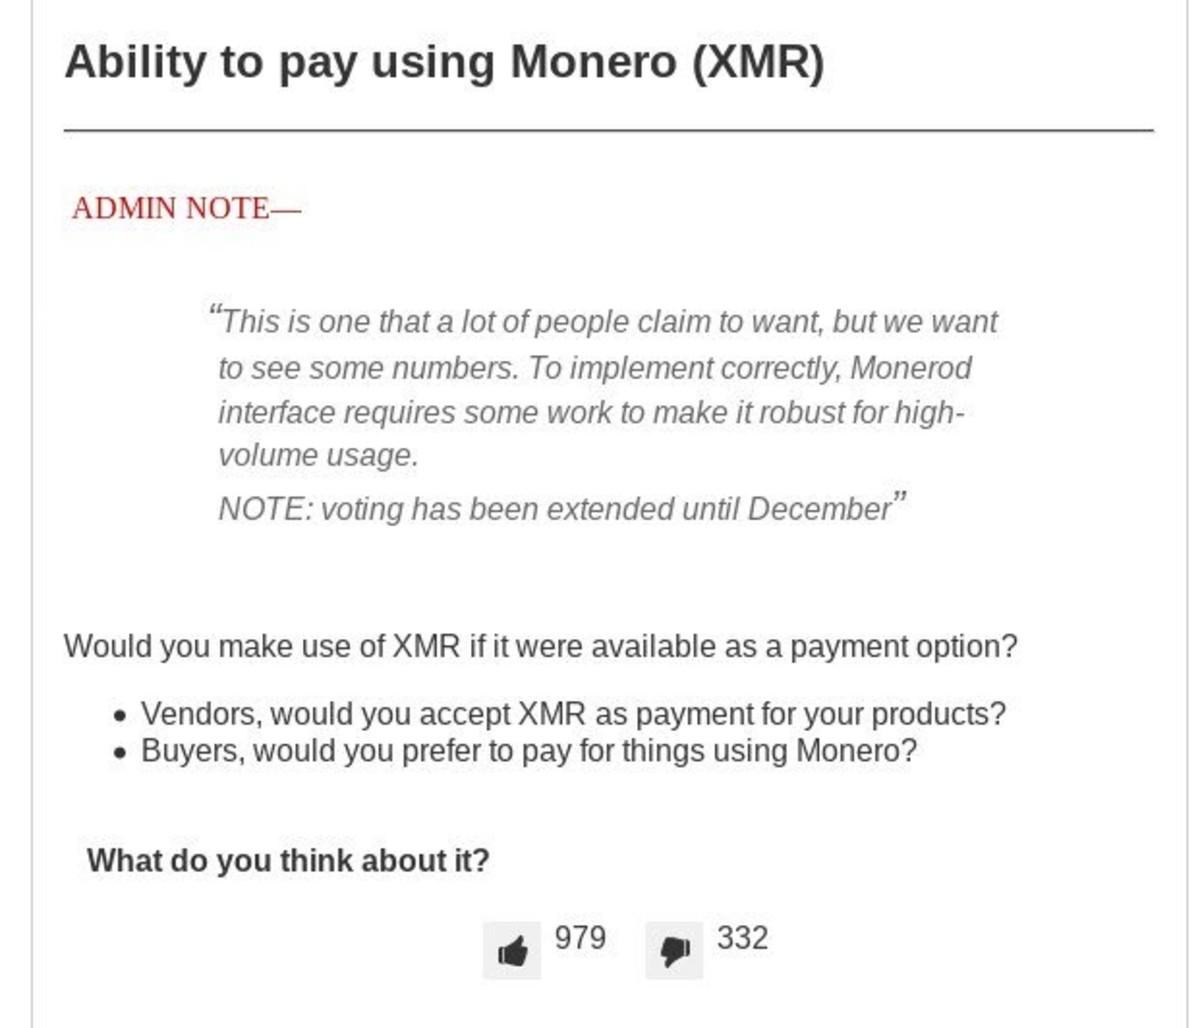 Darknet Markets Ability to pay using Monero